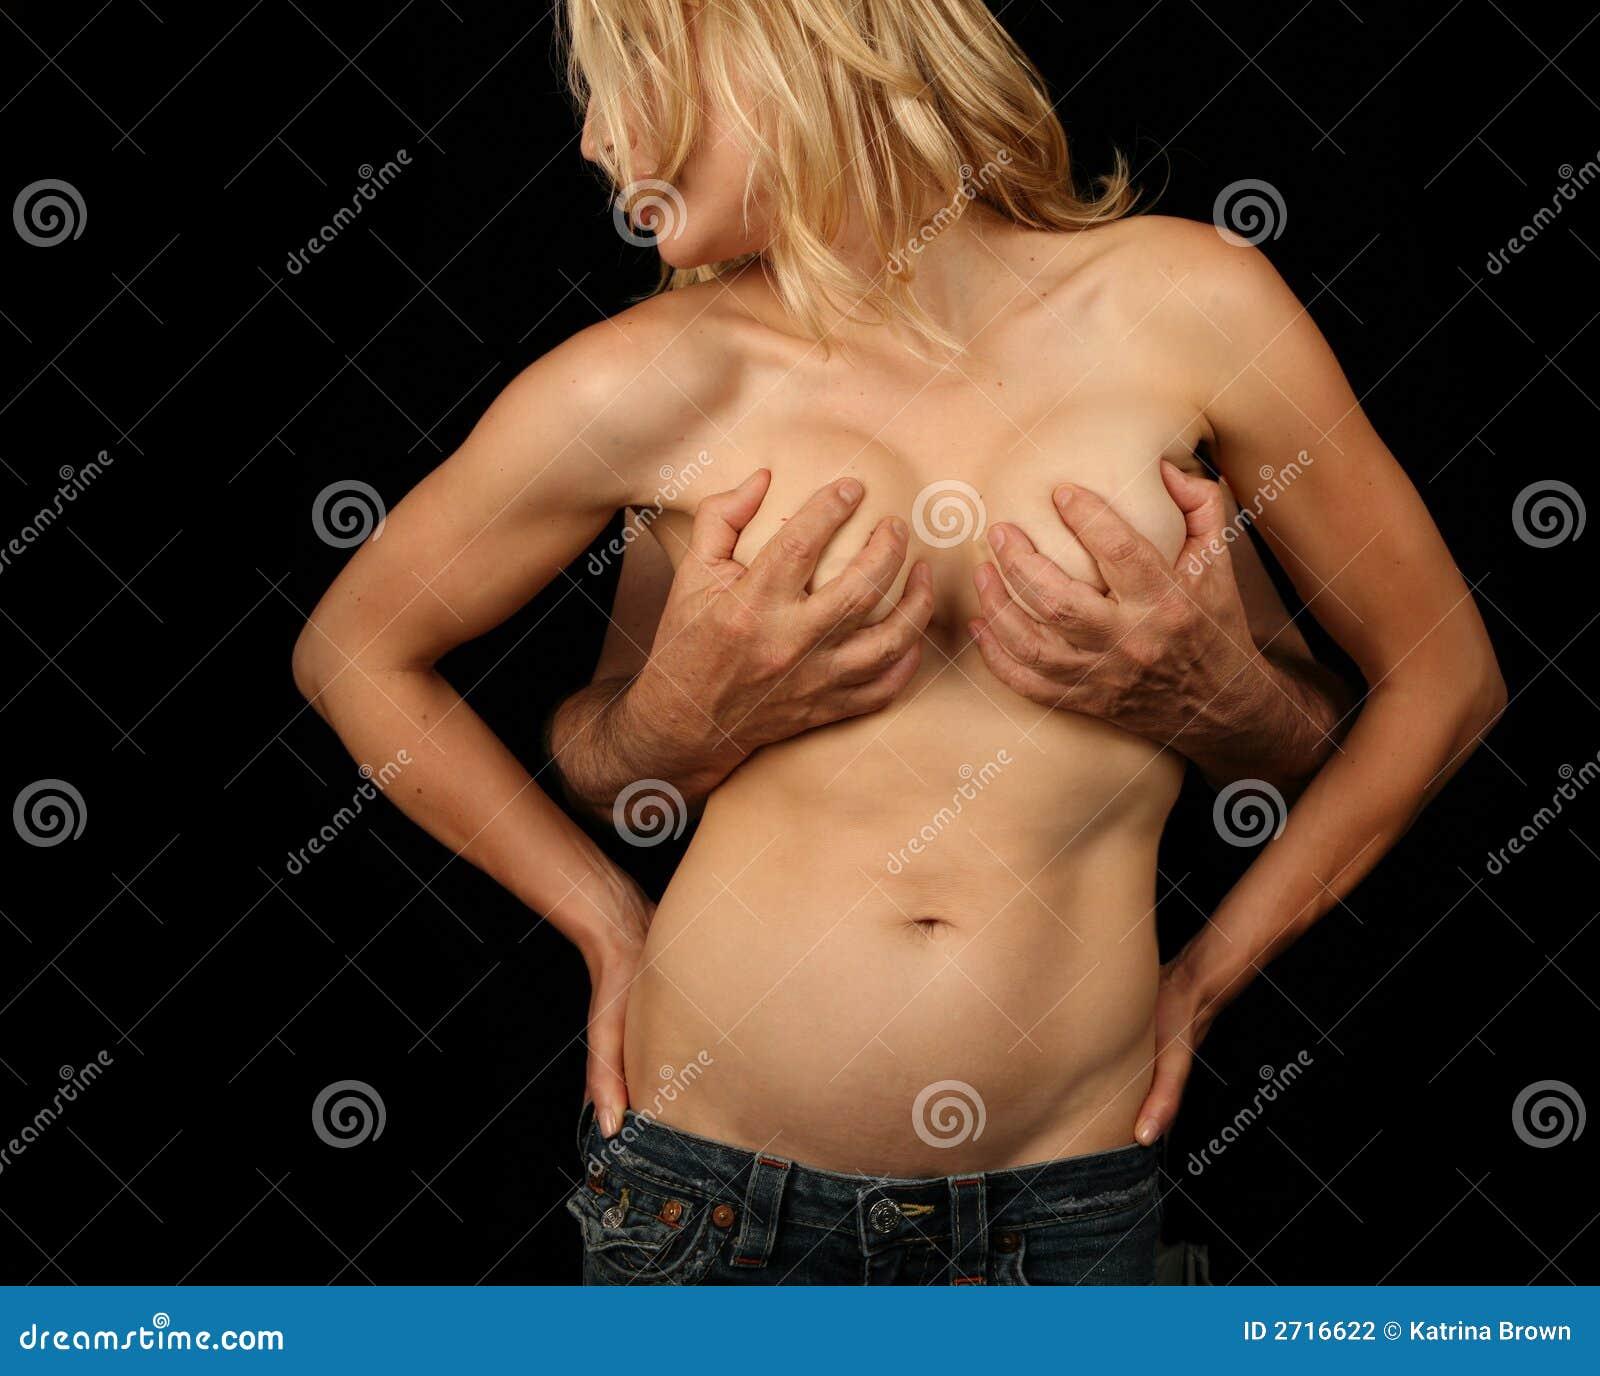 nude sex on planes